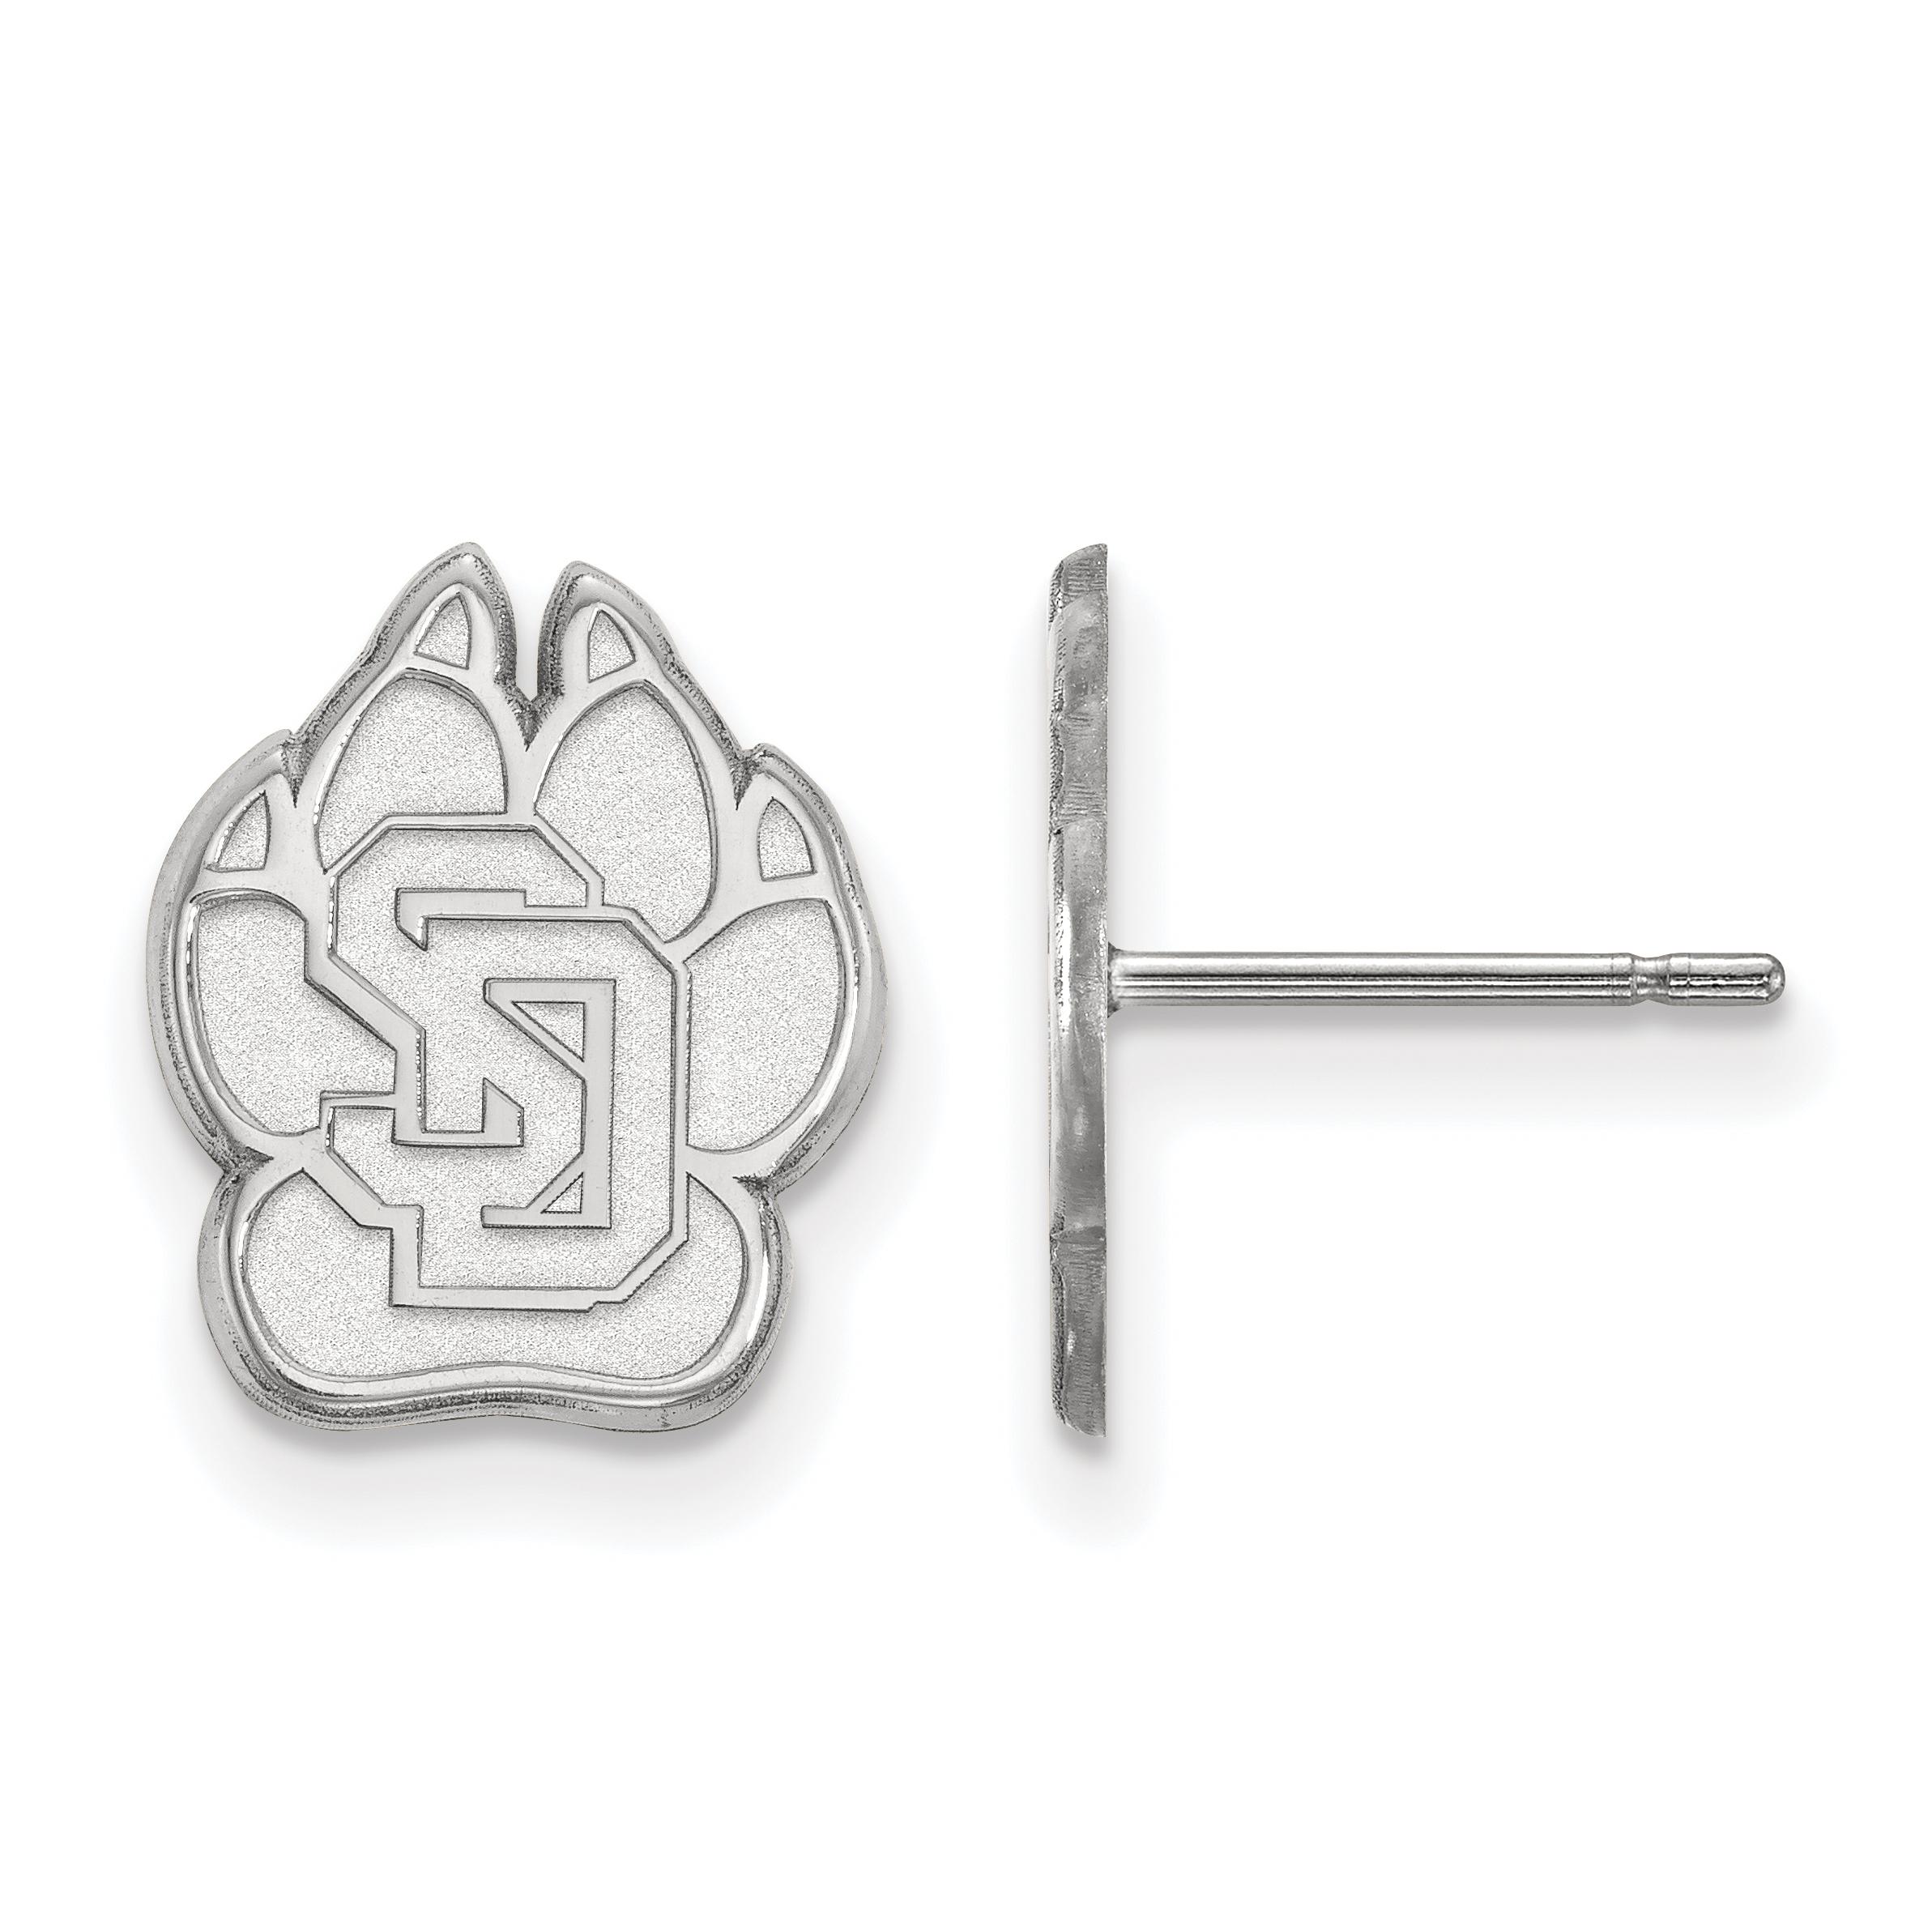 10kw University of South Dakota Small Post Earrings. weight: 1.43, Lengh: 13mm